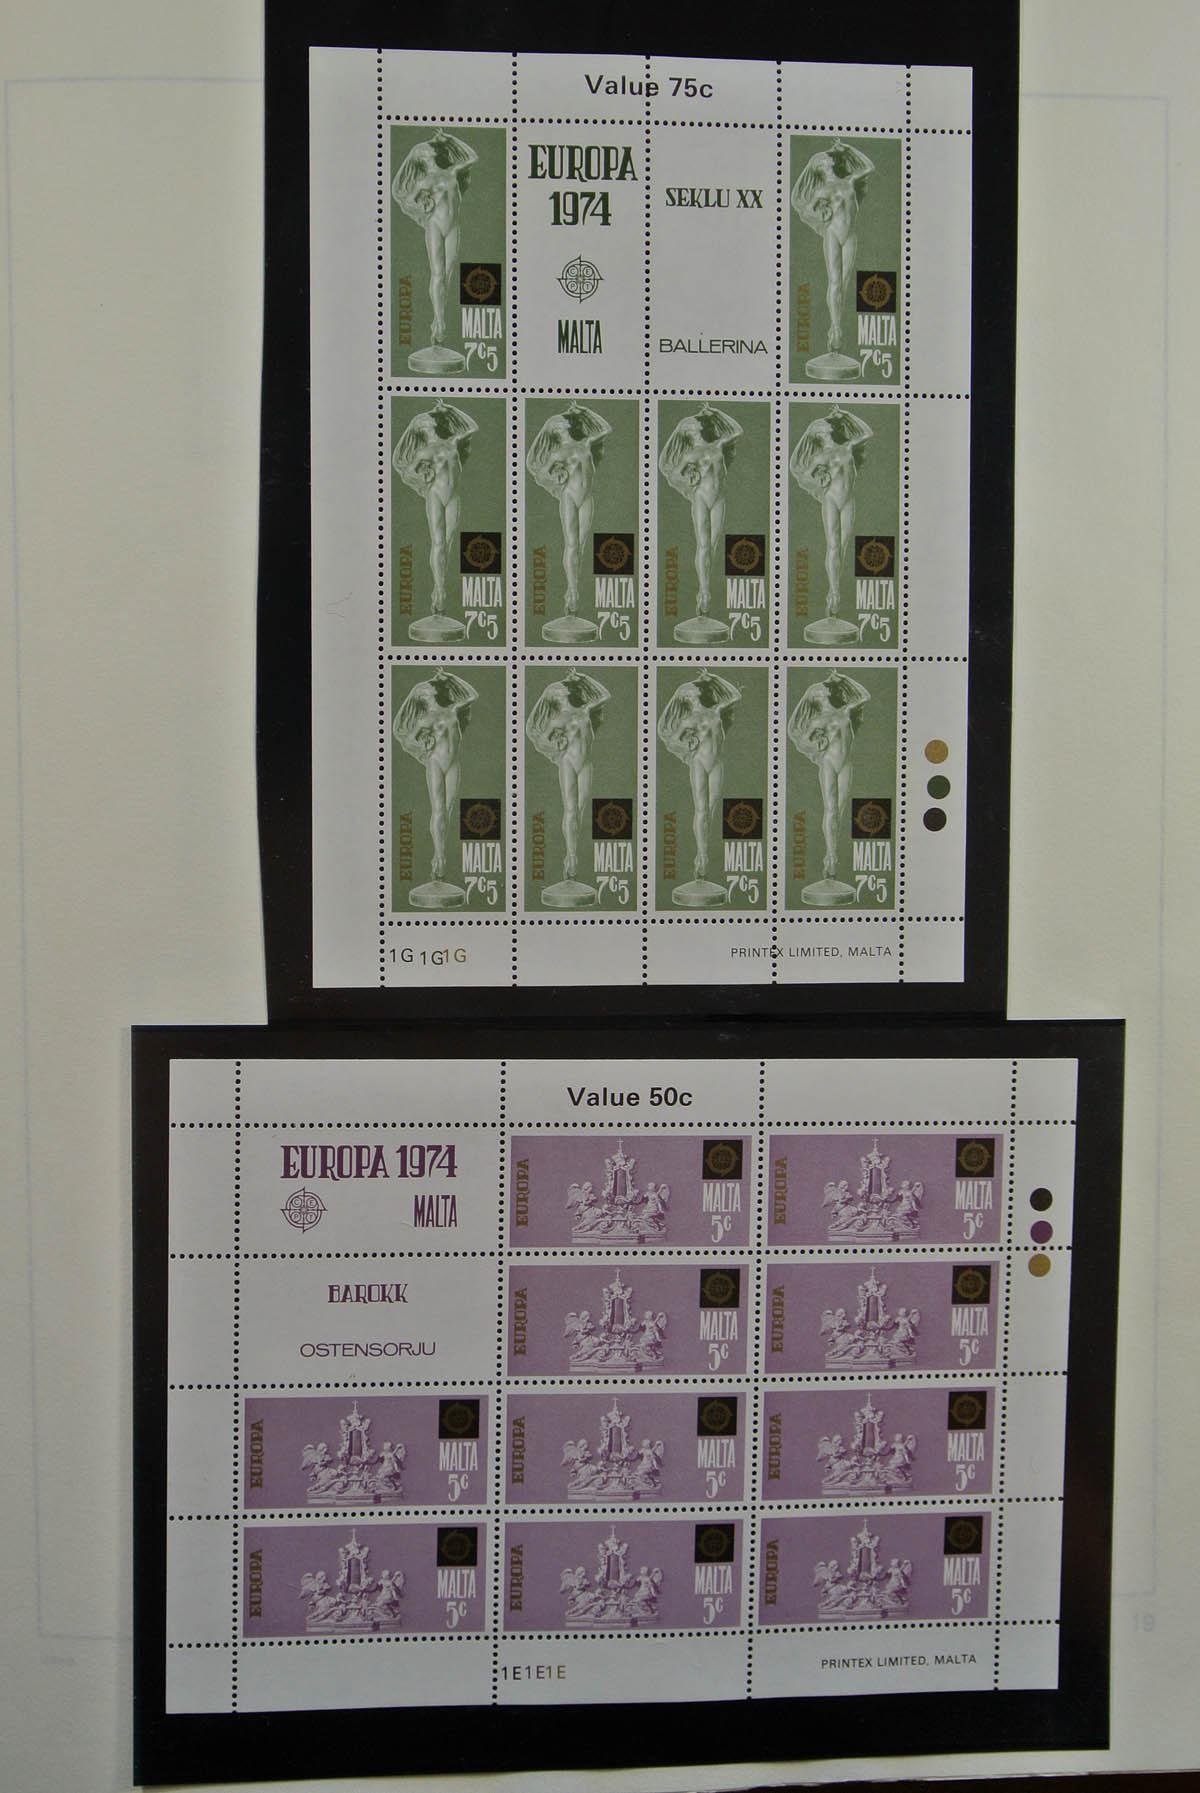 Stamp Auction - Malta - Auction #40 Europe, lot 27304